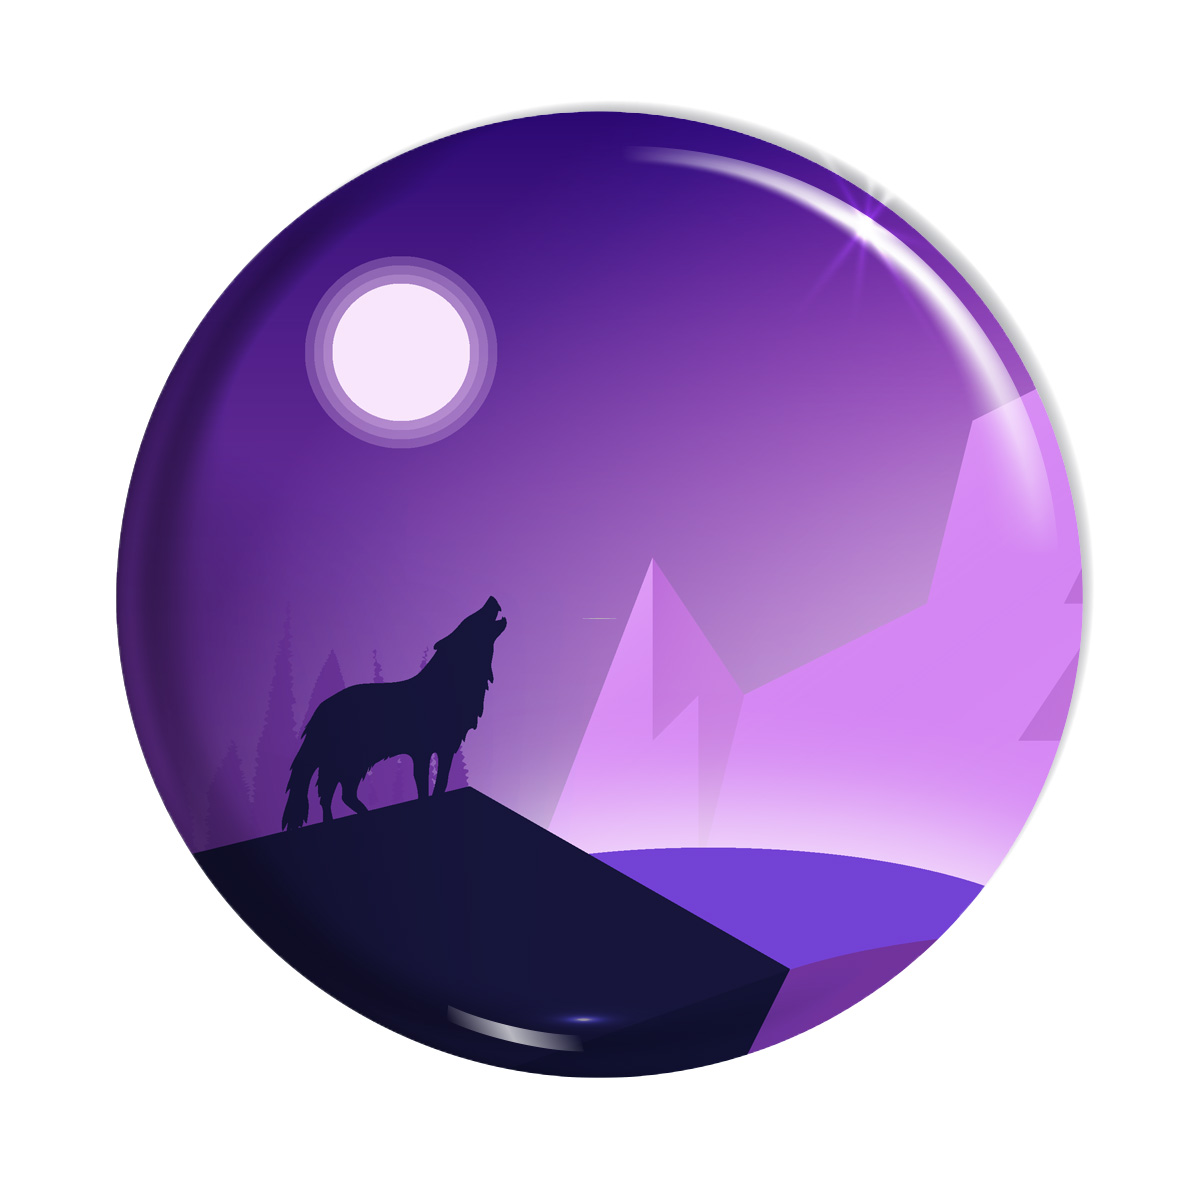 پیکسل کد پیکسل  اسانا طرح گرگ طبیعت شب ماه کد ASA017